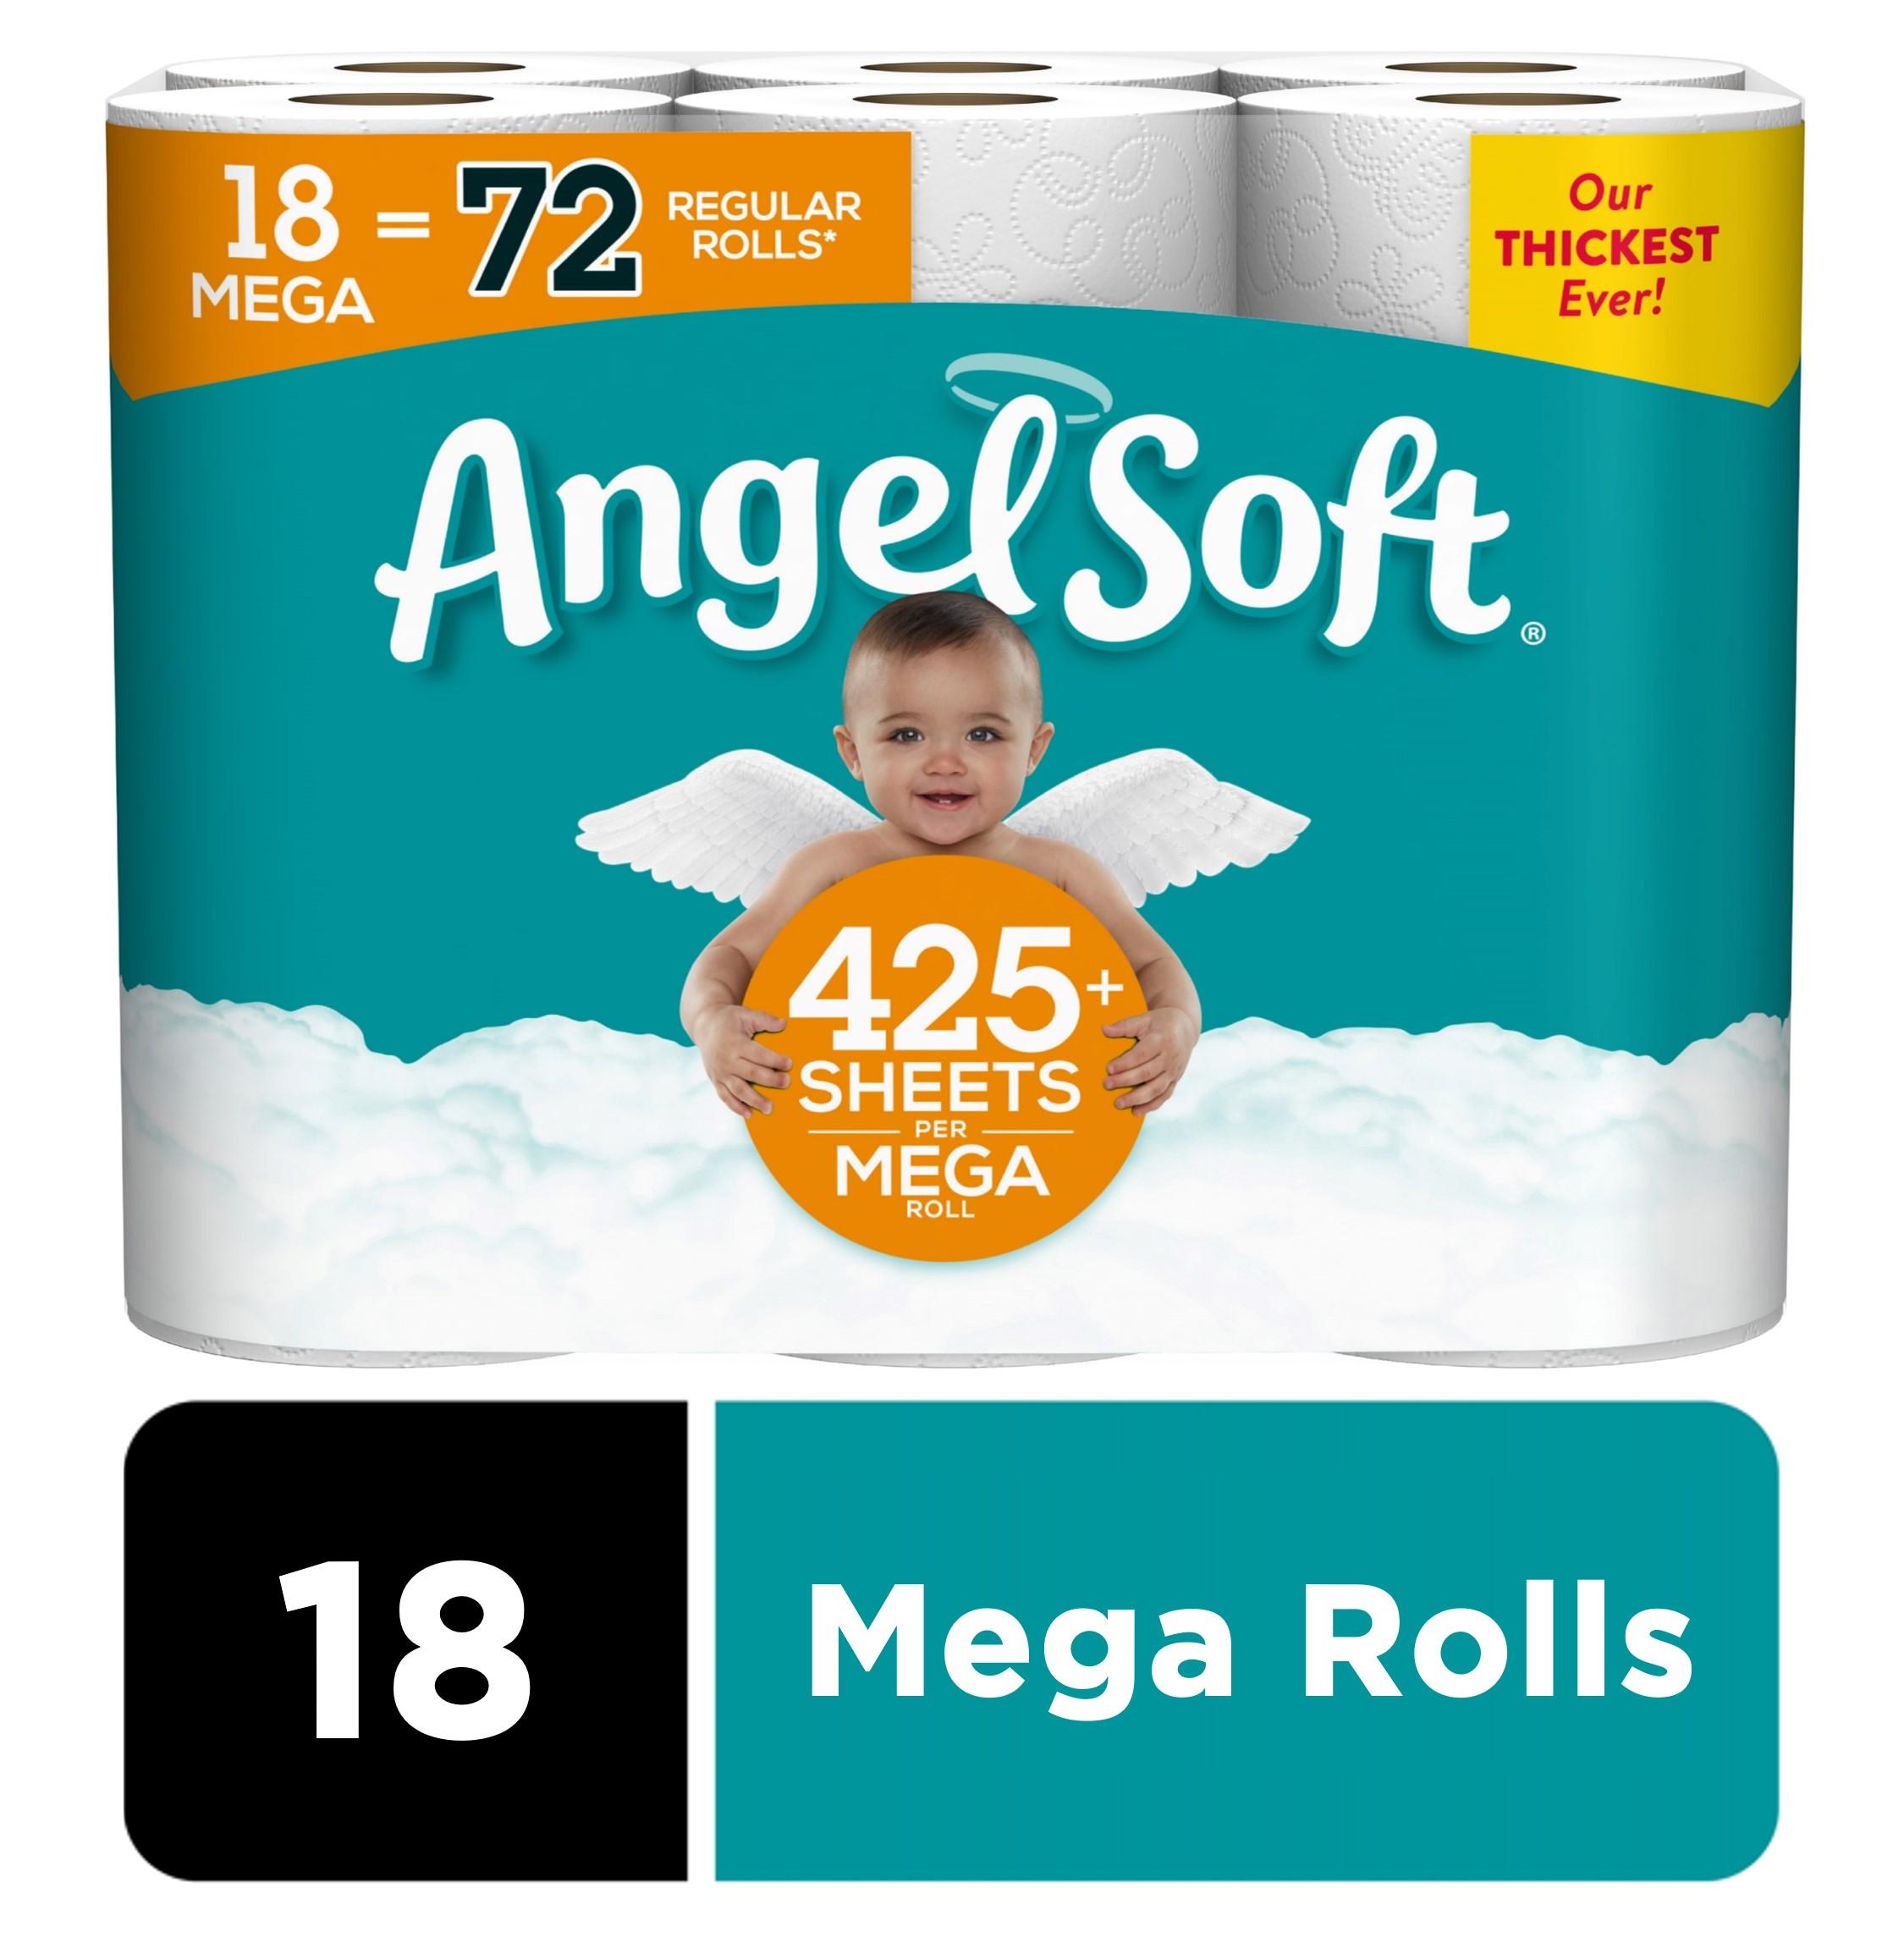 Angel Soft Toilet Paper, 18 Mega Rolls (= 72 Regular Rolls) $14.97